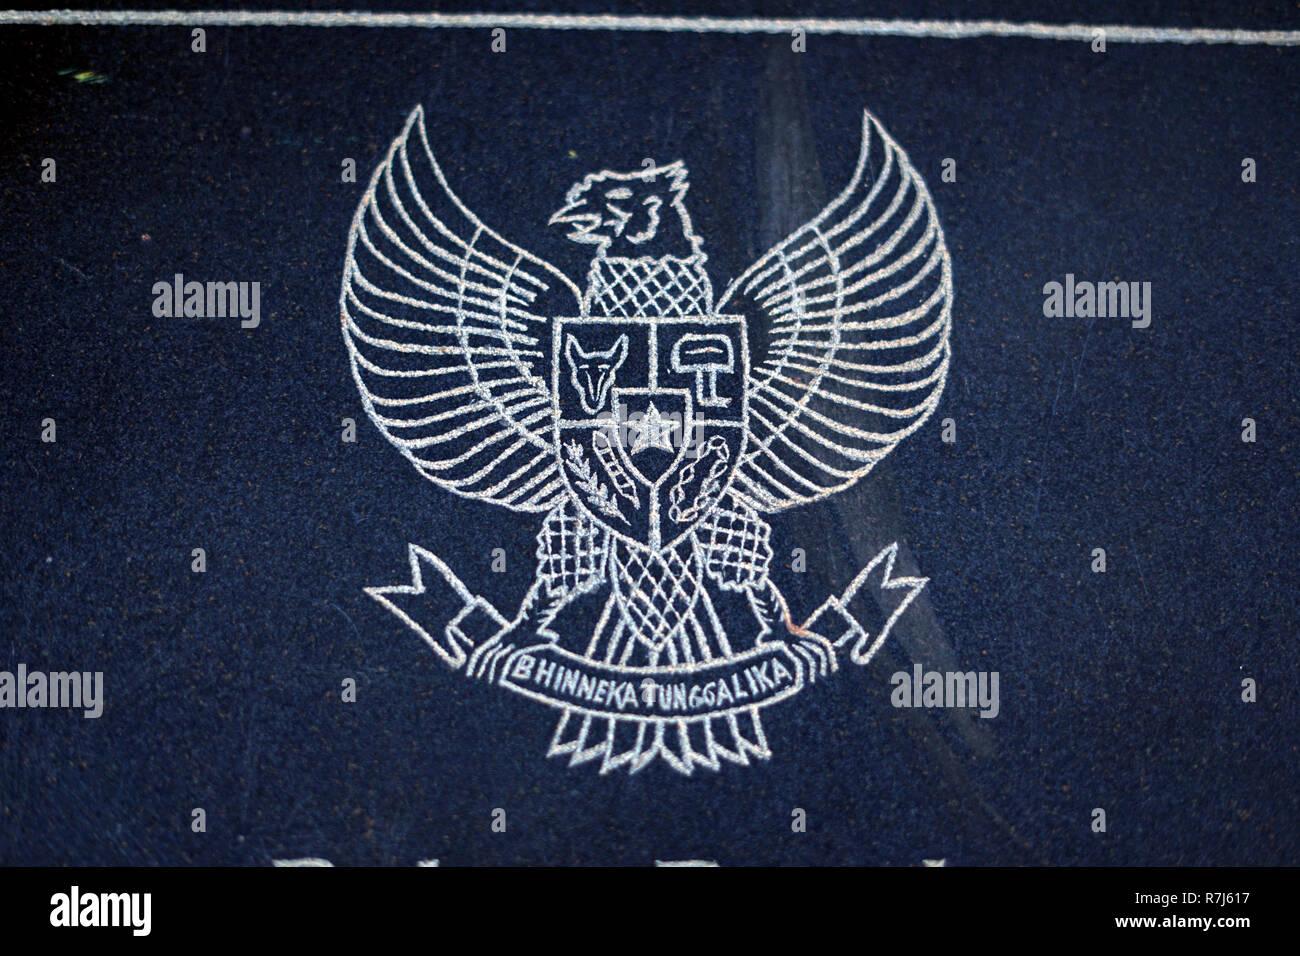 Garuda Pancasila, Indonesia Coat of Arms - Stock Image